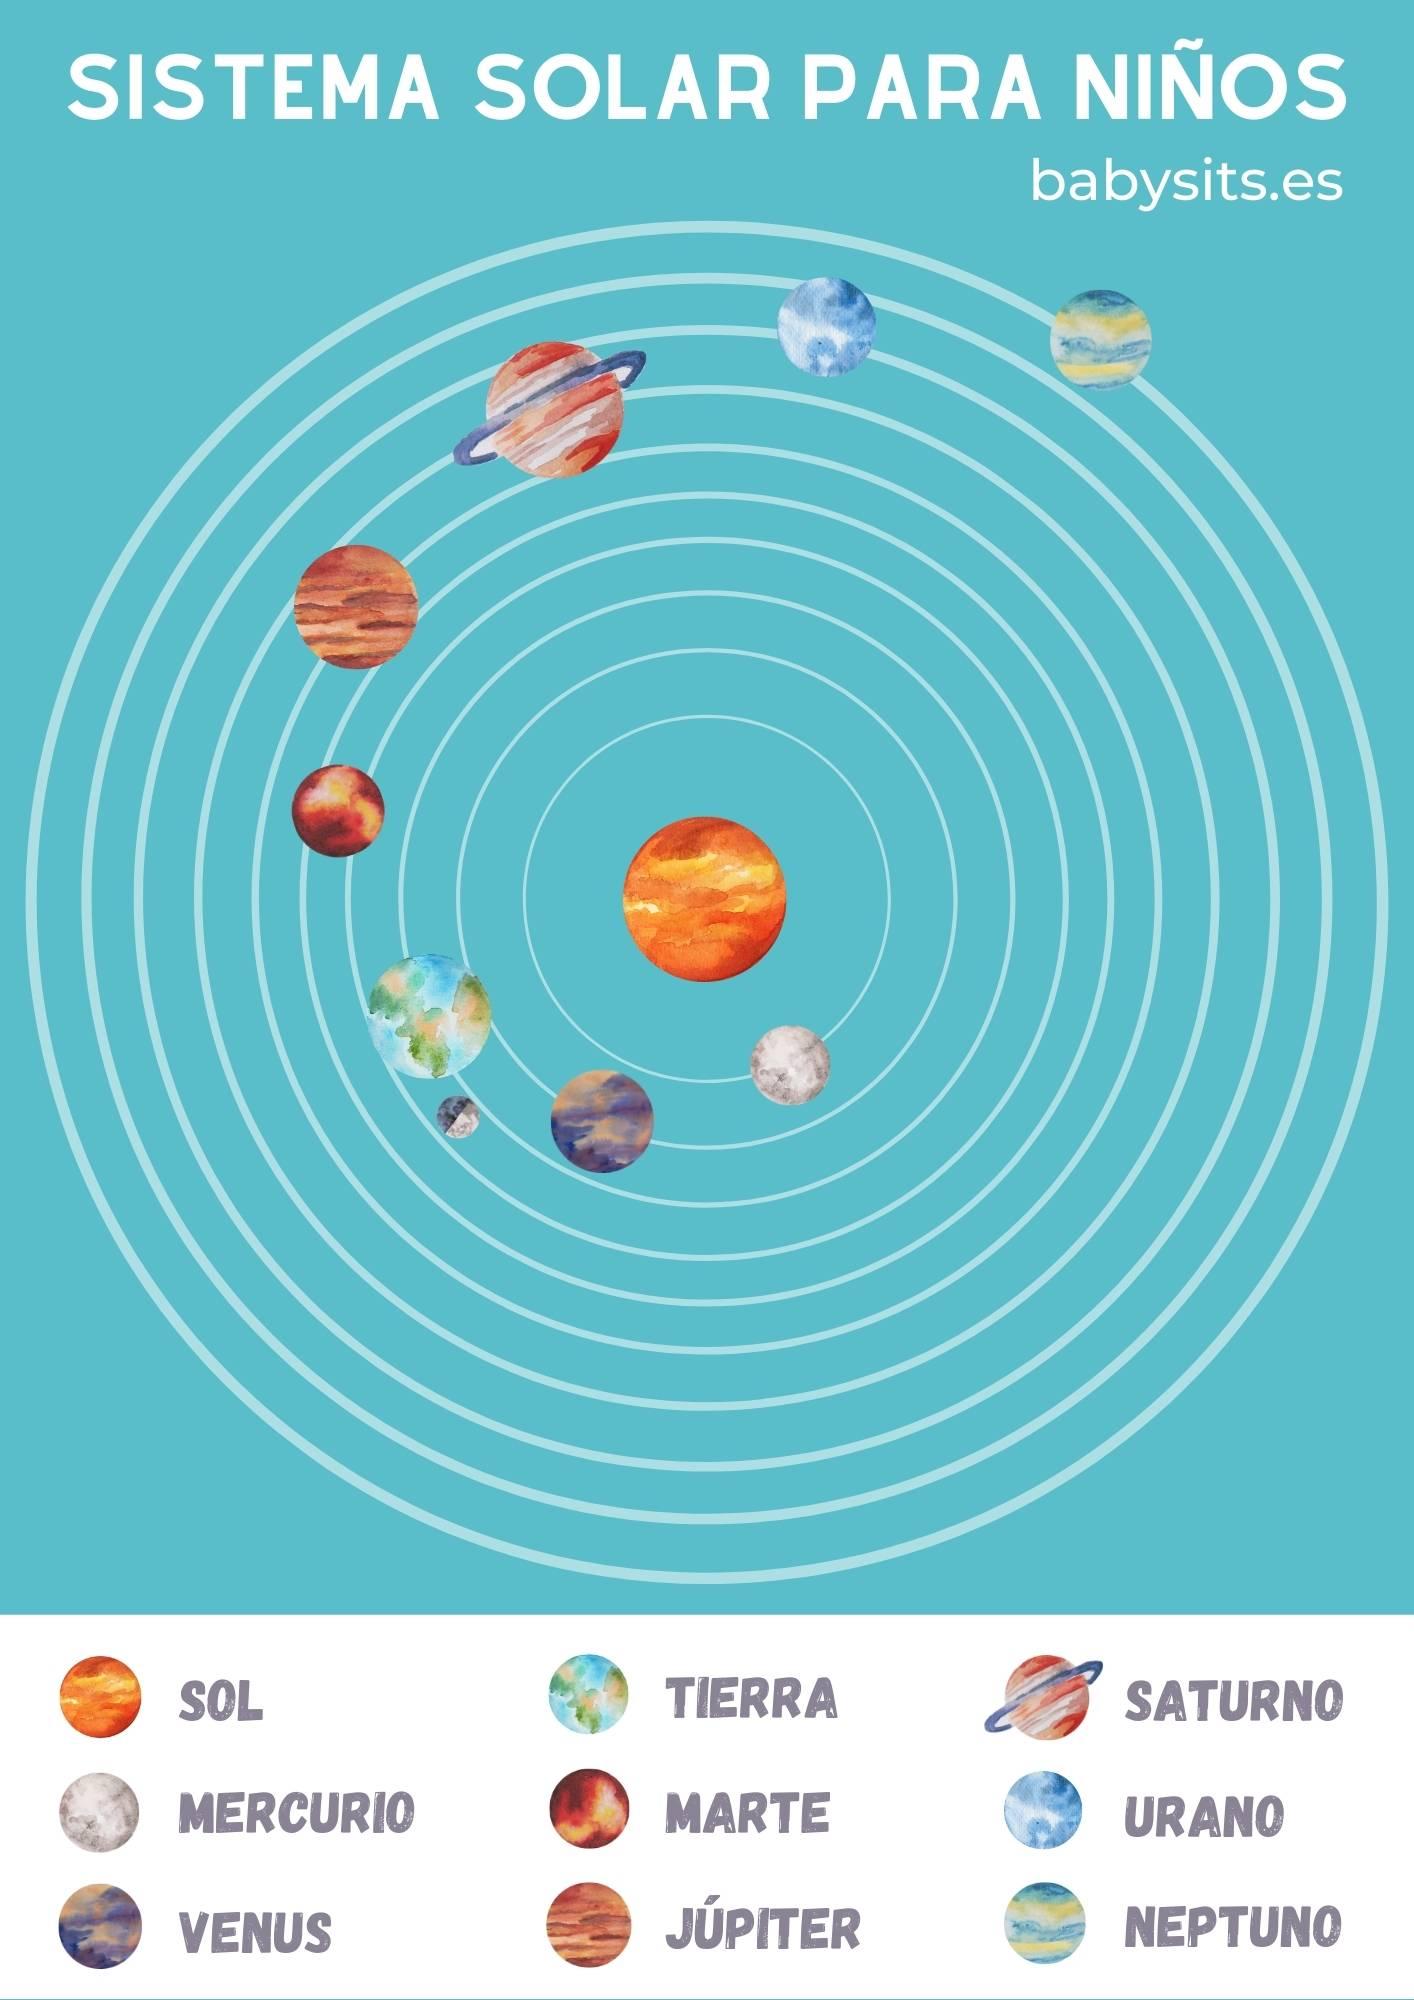 Sistema solar para niños